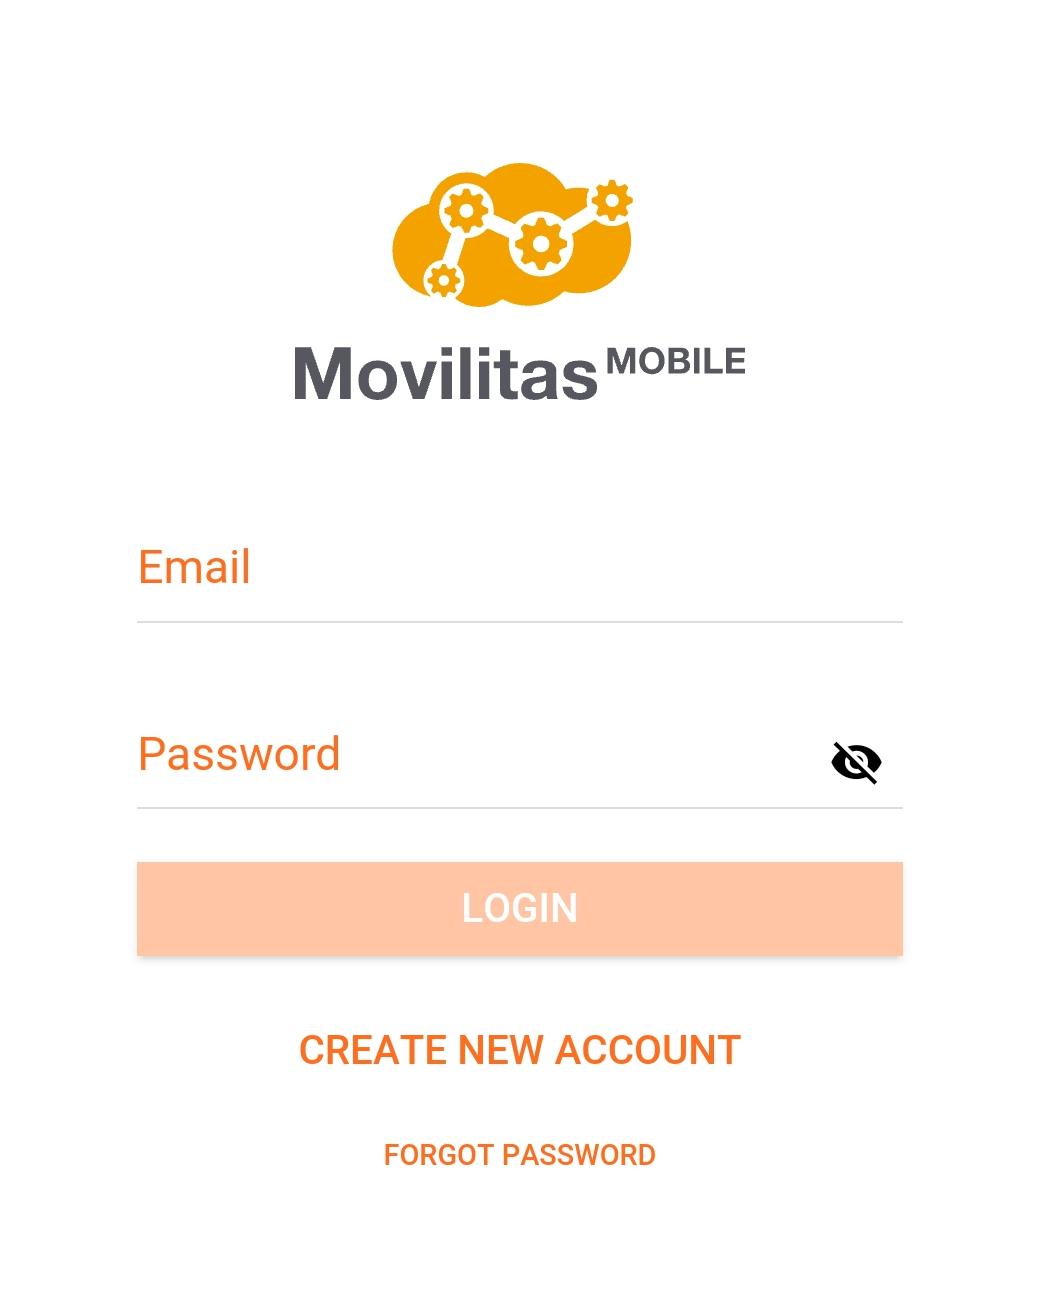 Movilitas Mobile v2